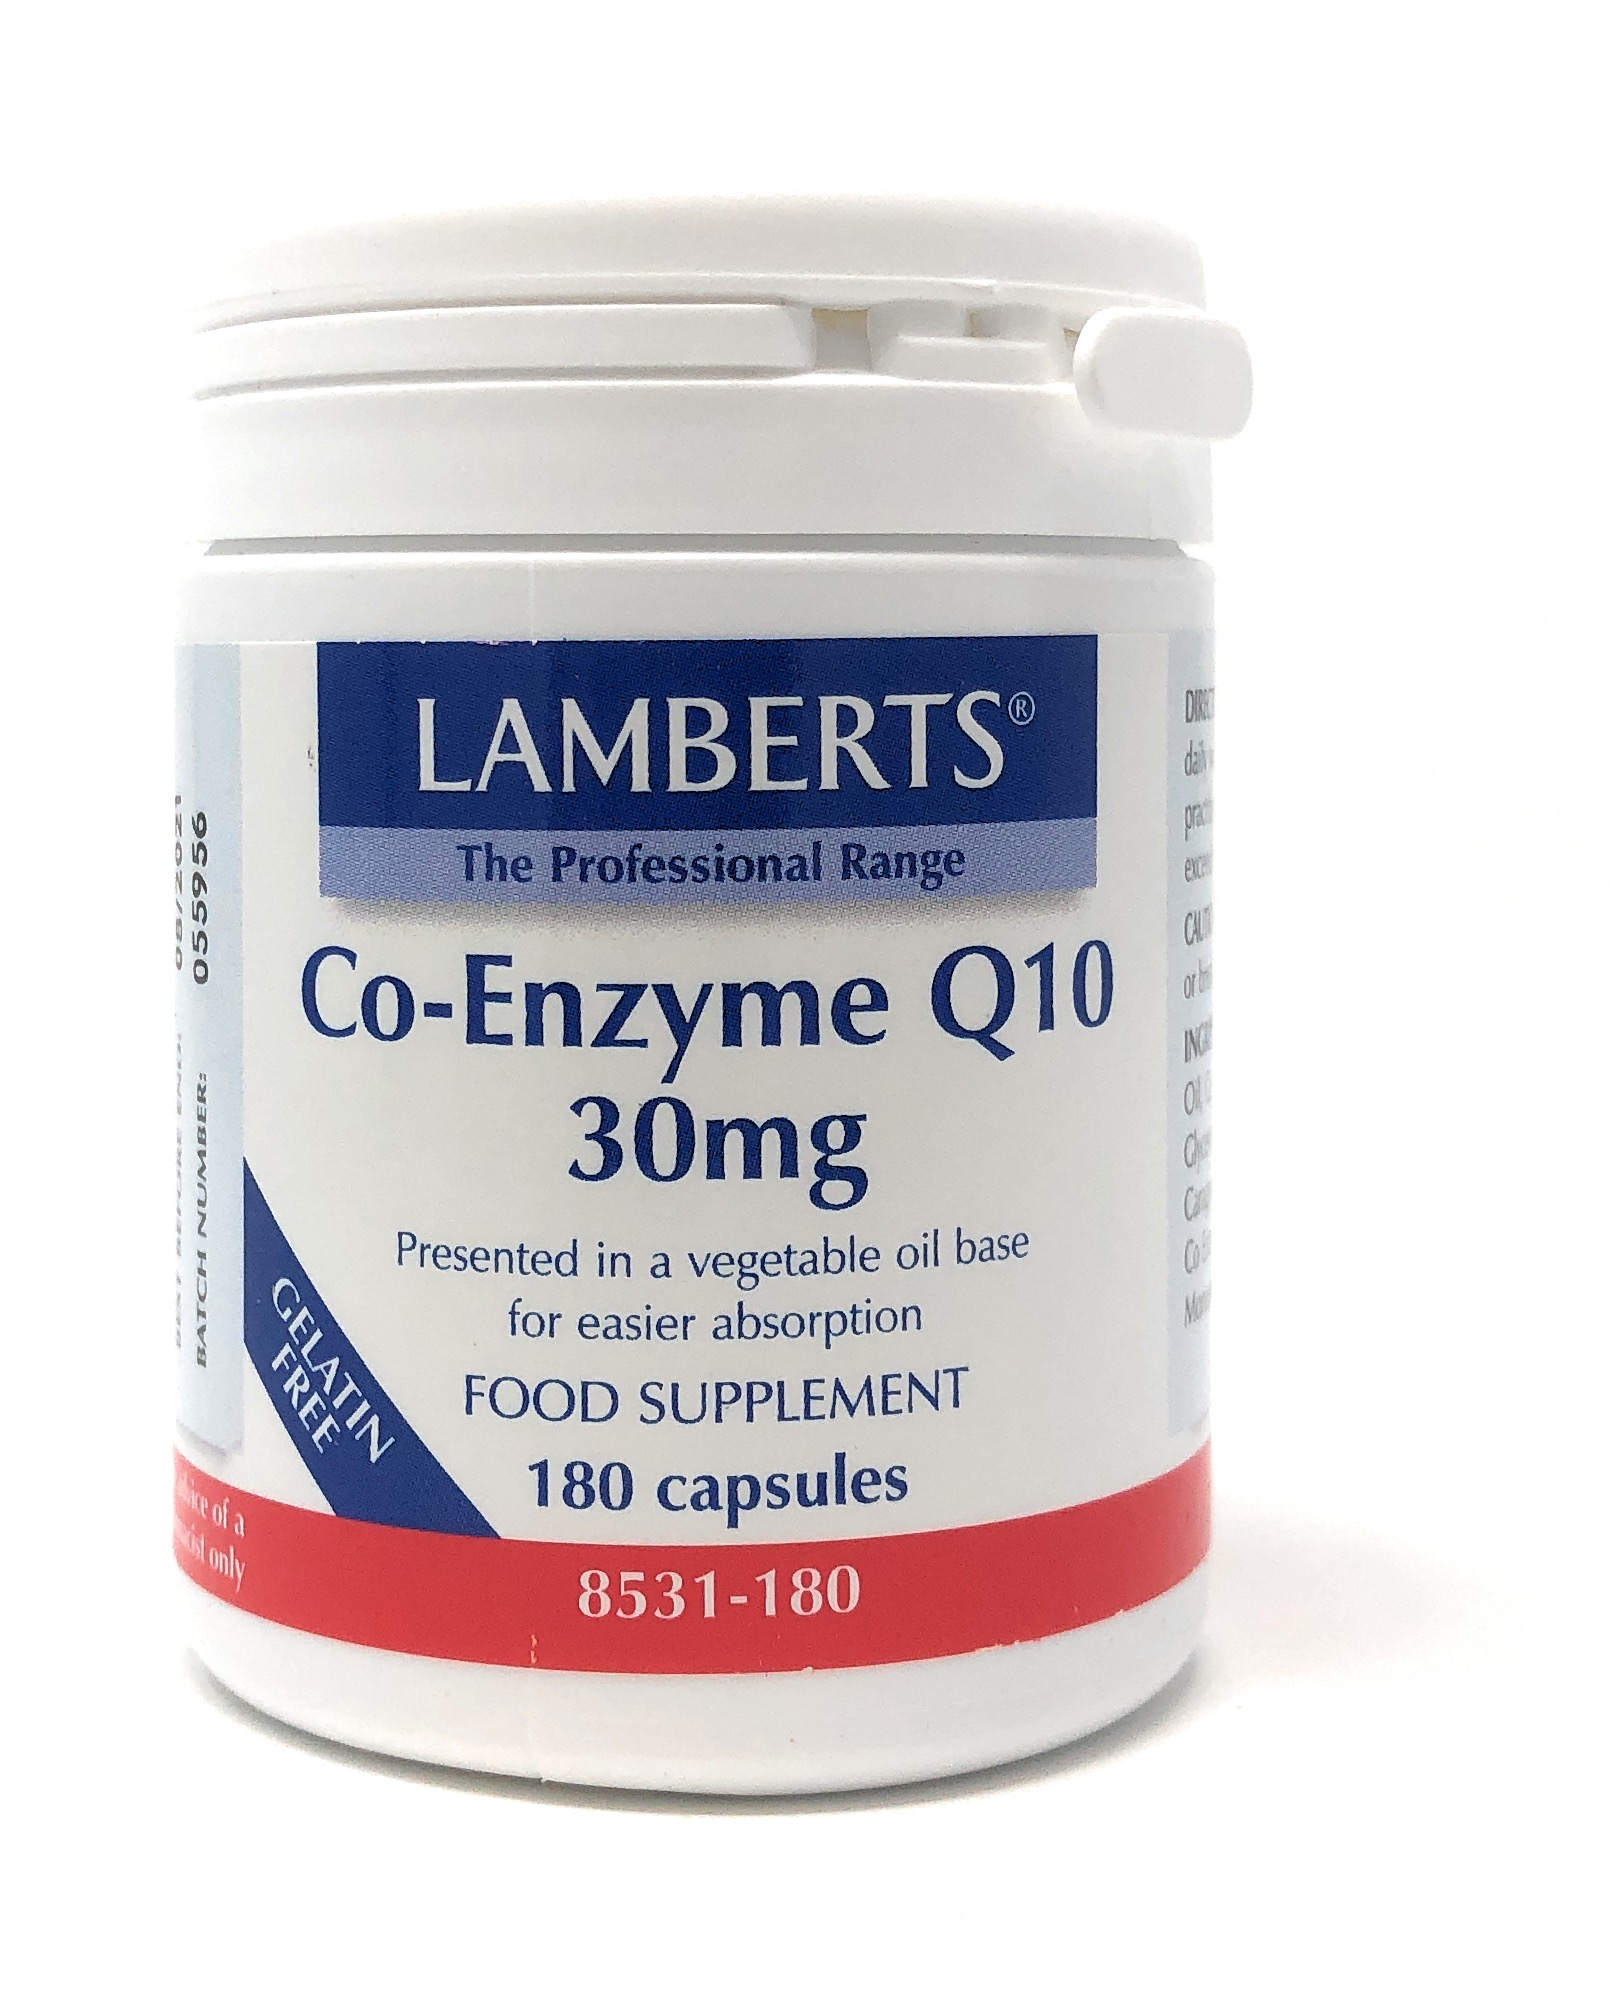 Lamberts Healthcare Co-Enzyme Q10 30mg 180 veg. Kapseln